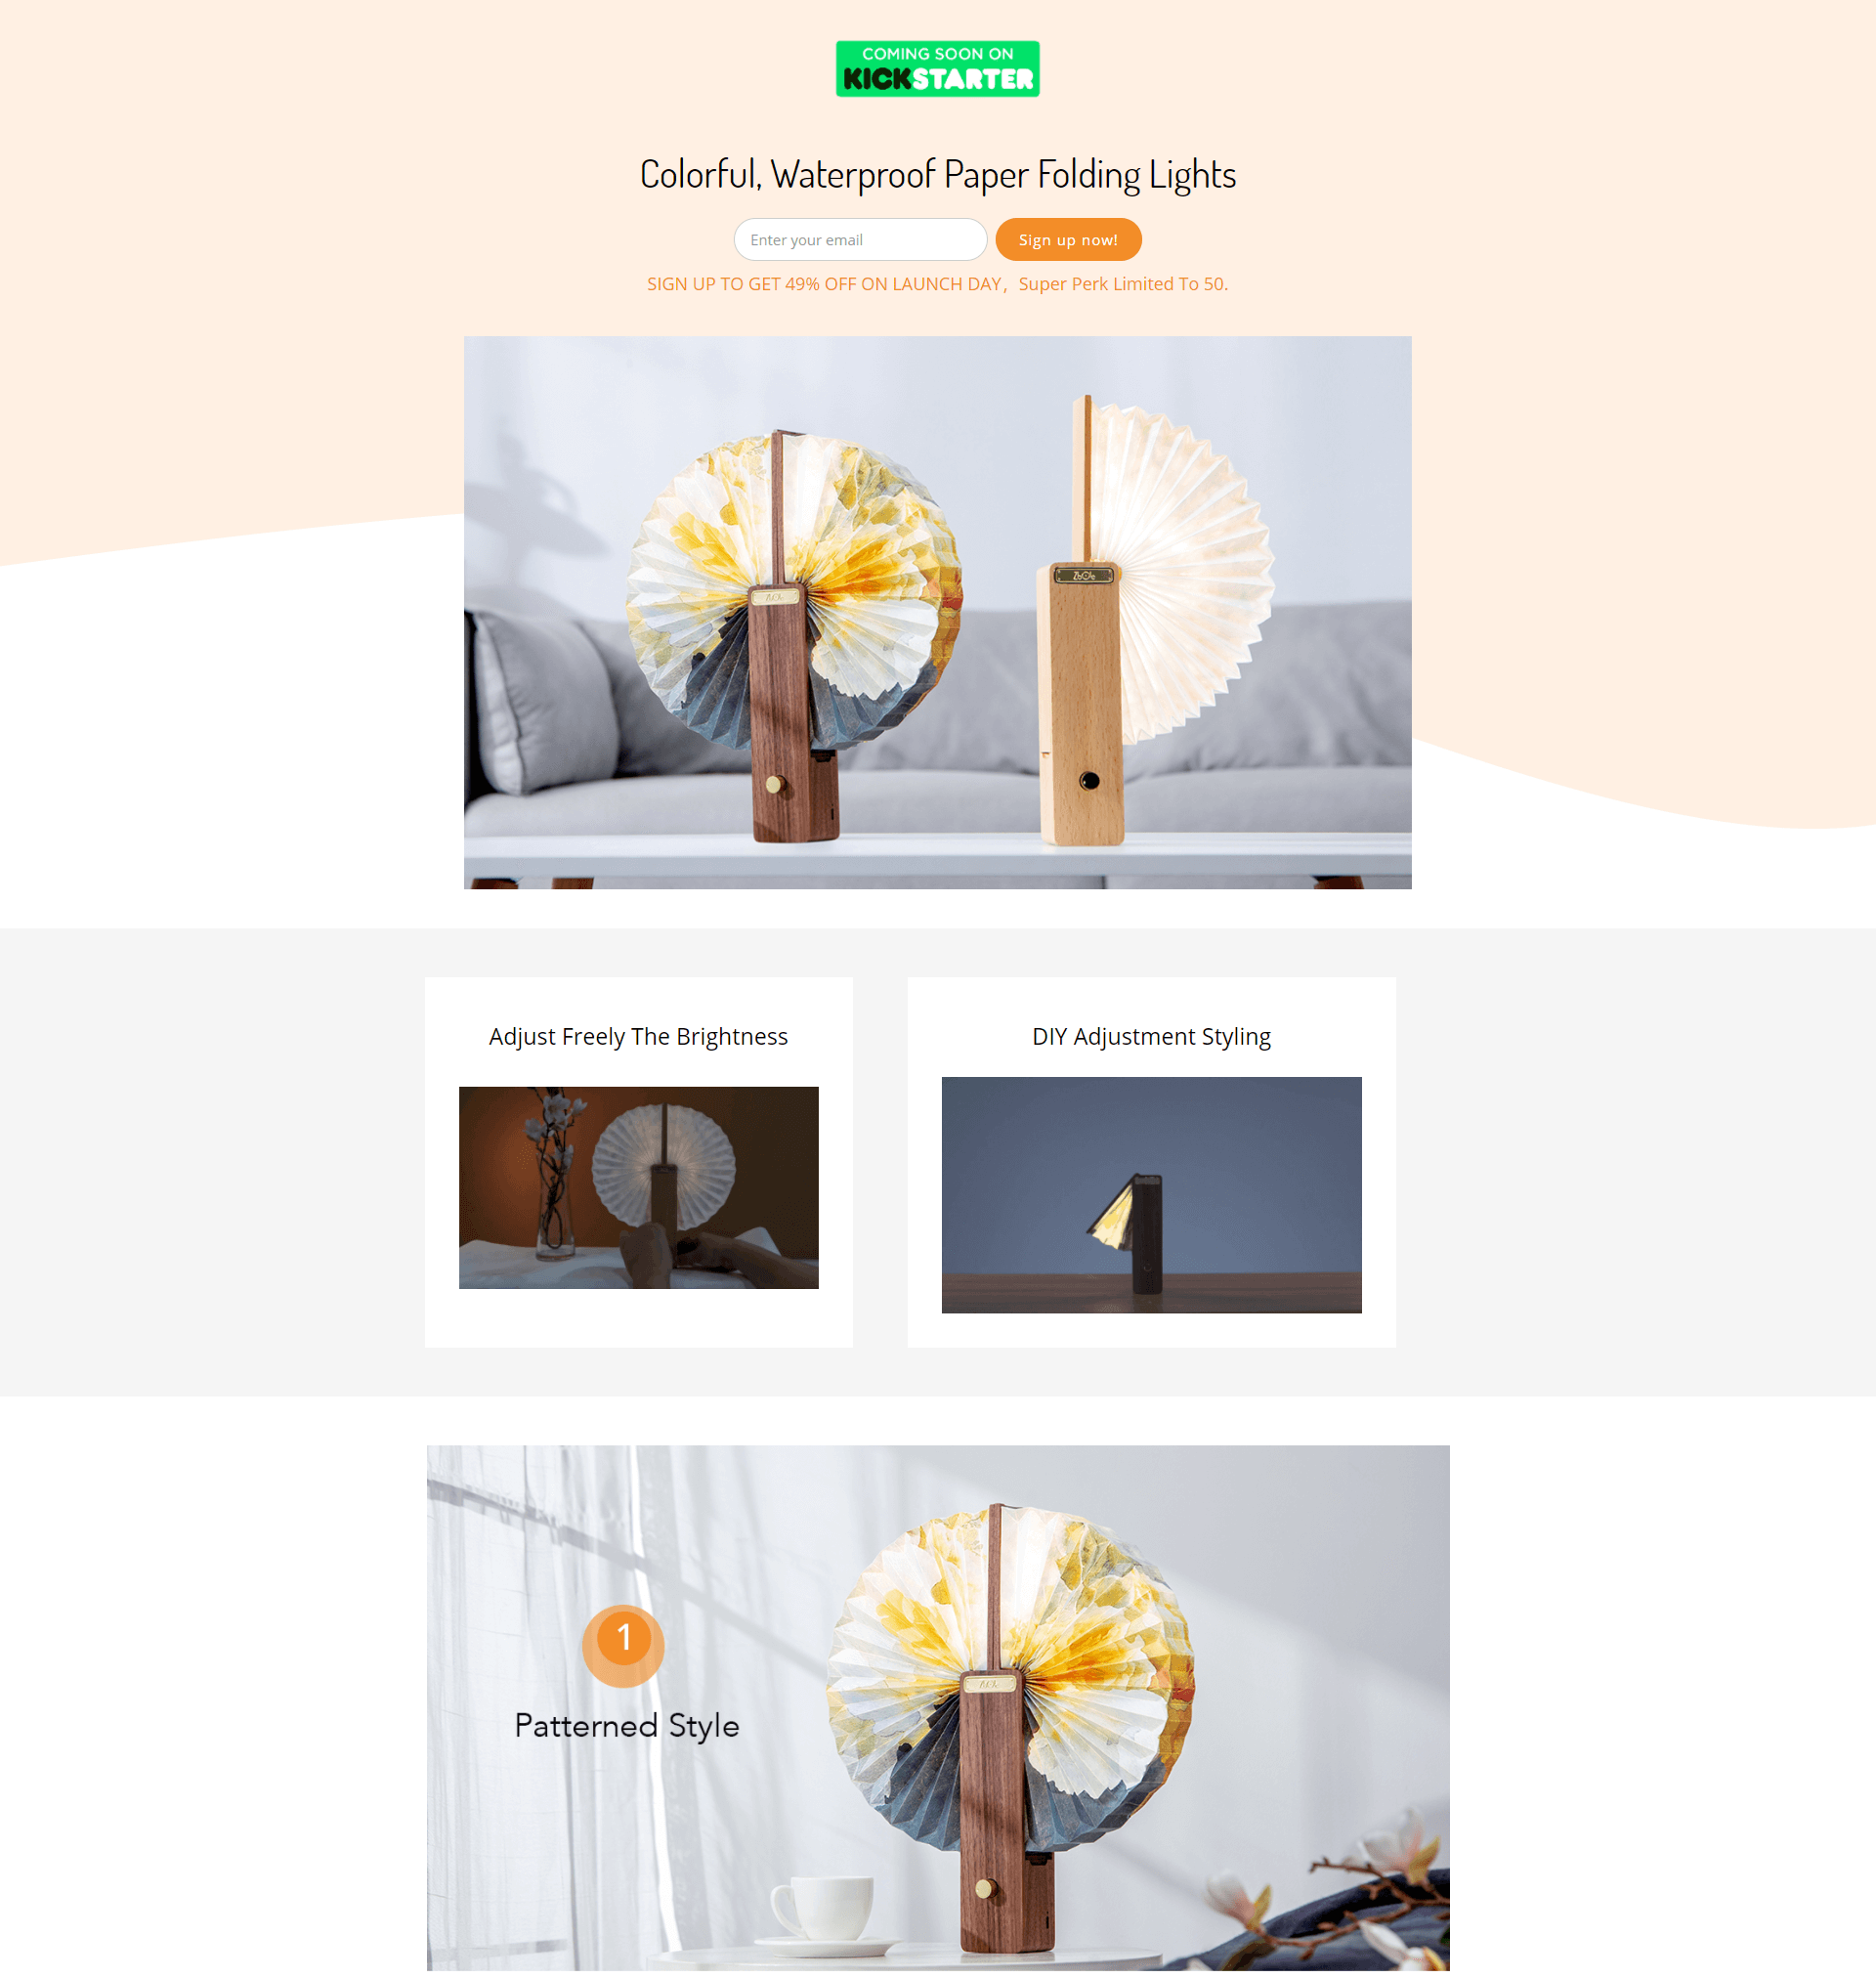 zbole omlamp landing page